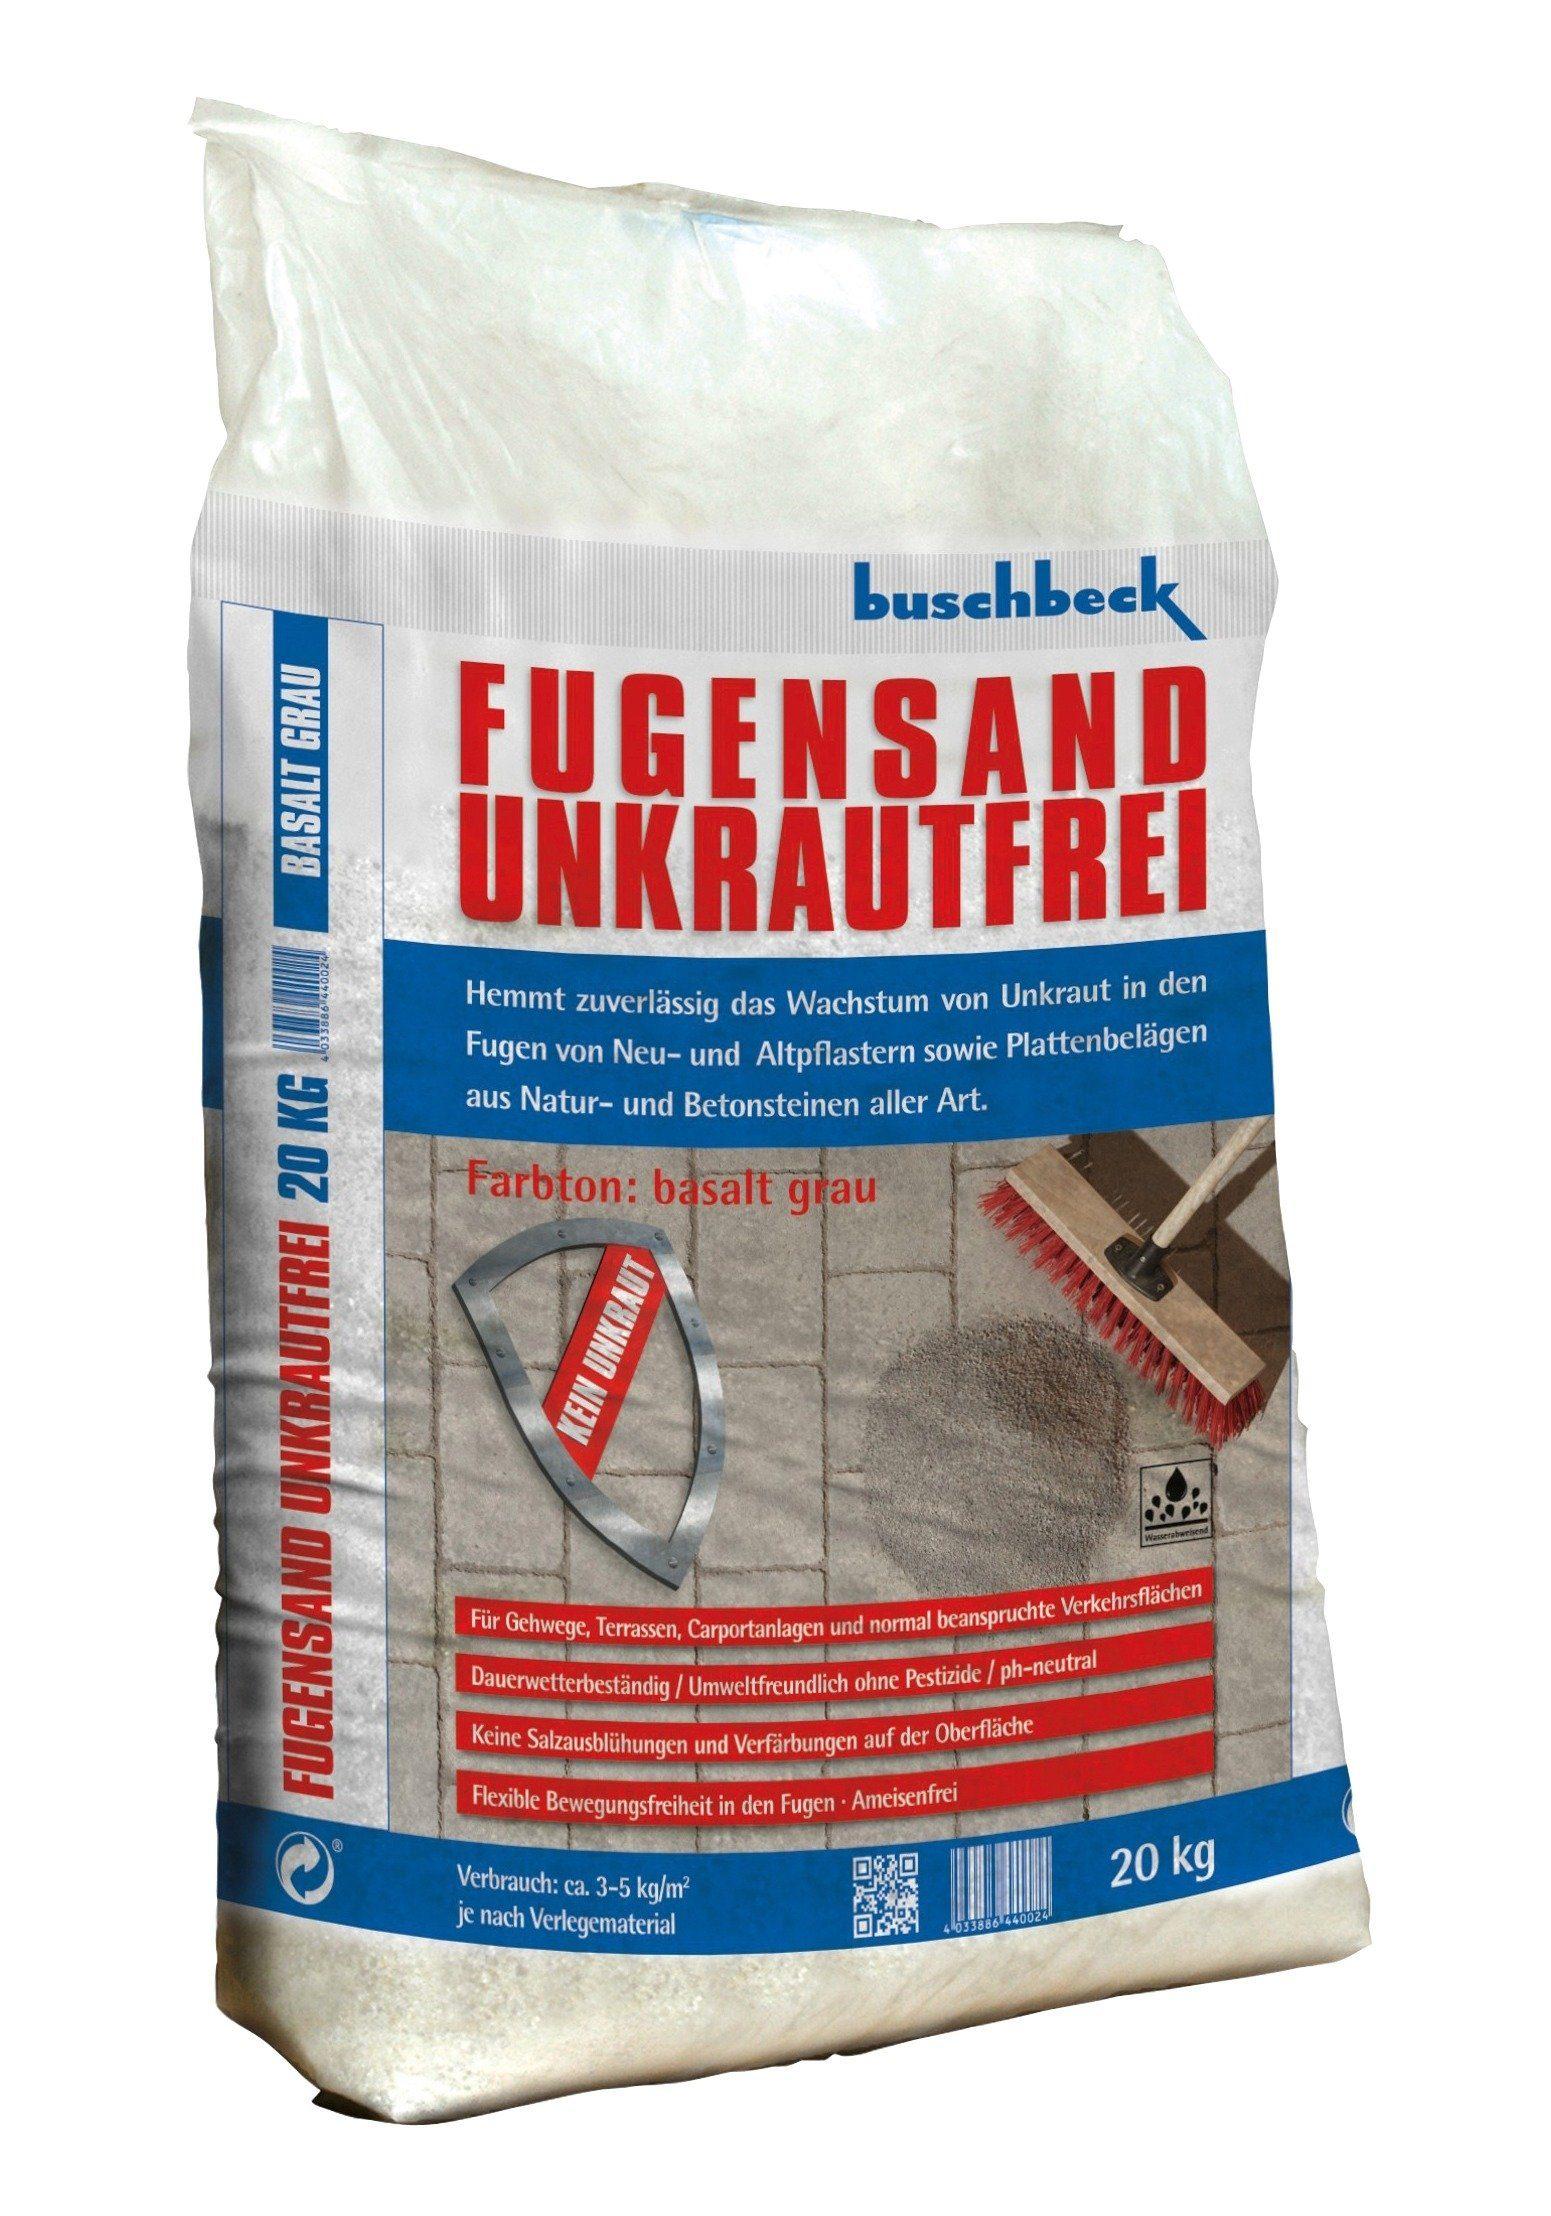 Buschbeck Fugensand Unkrautfrei, grau